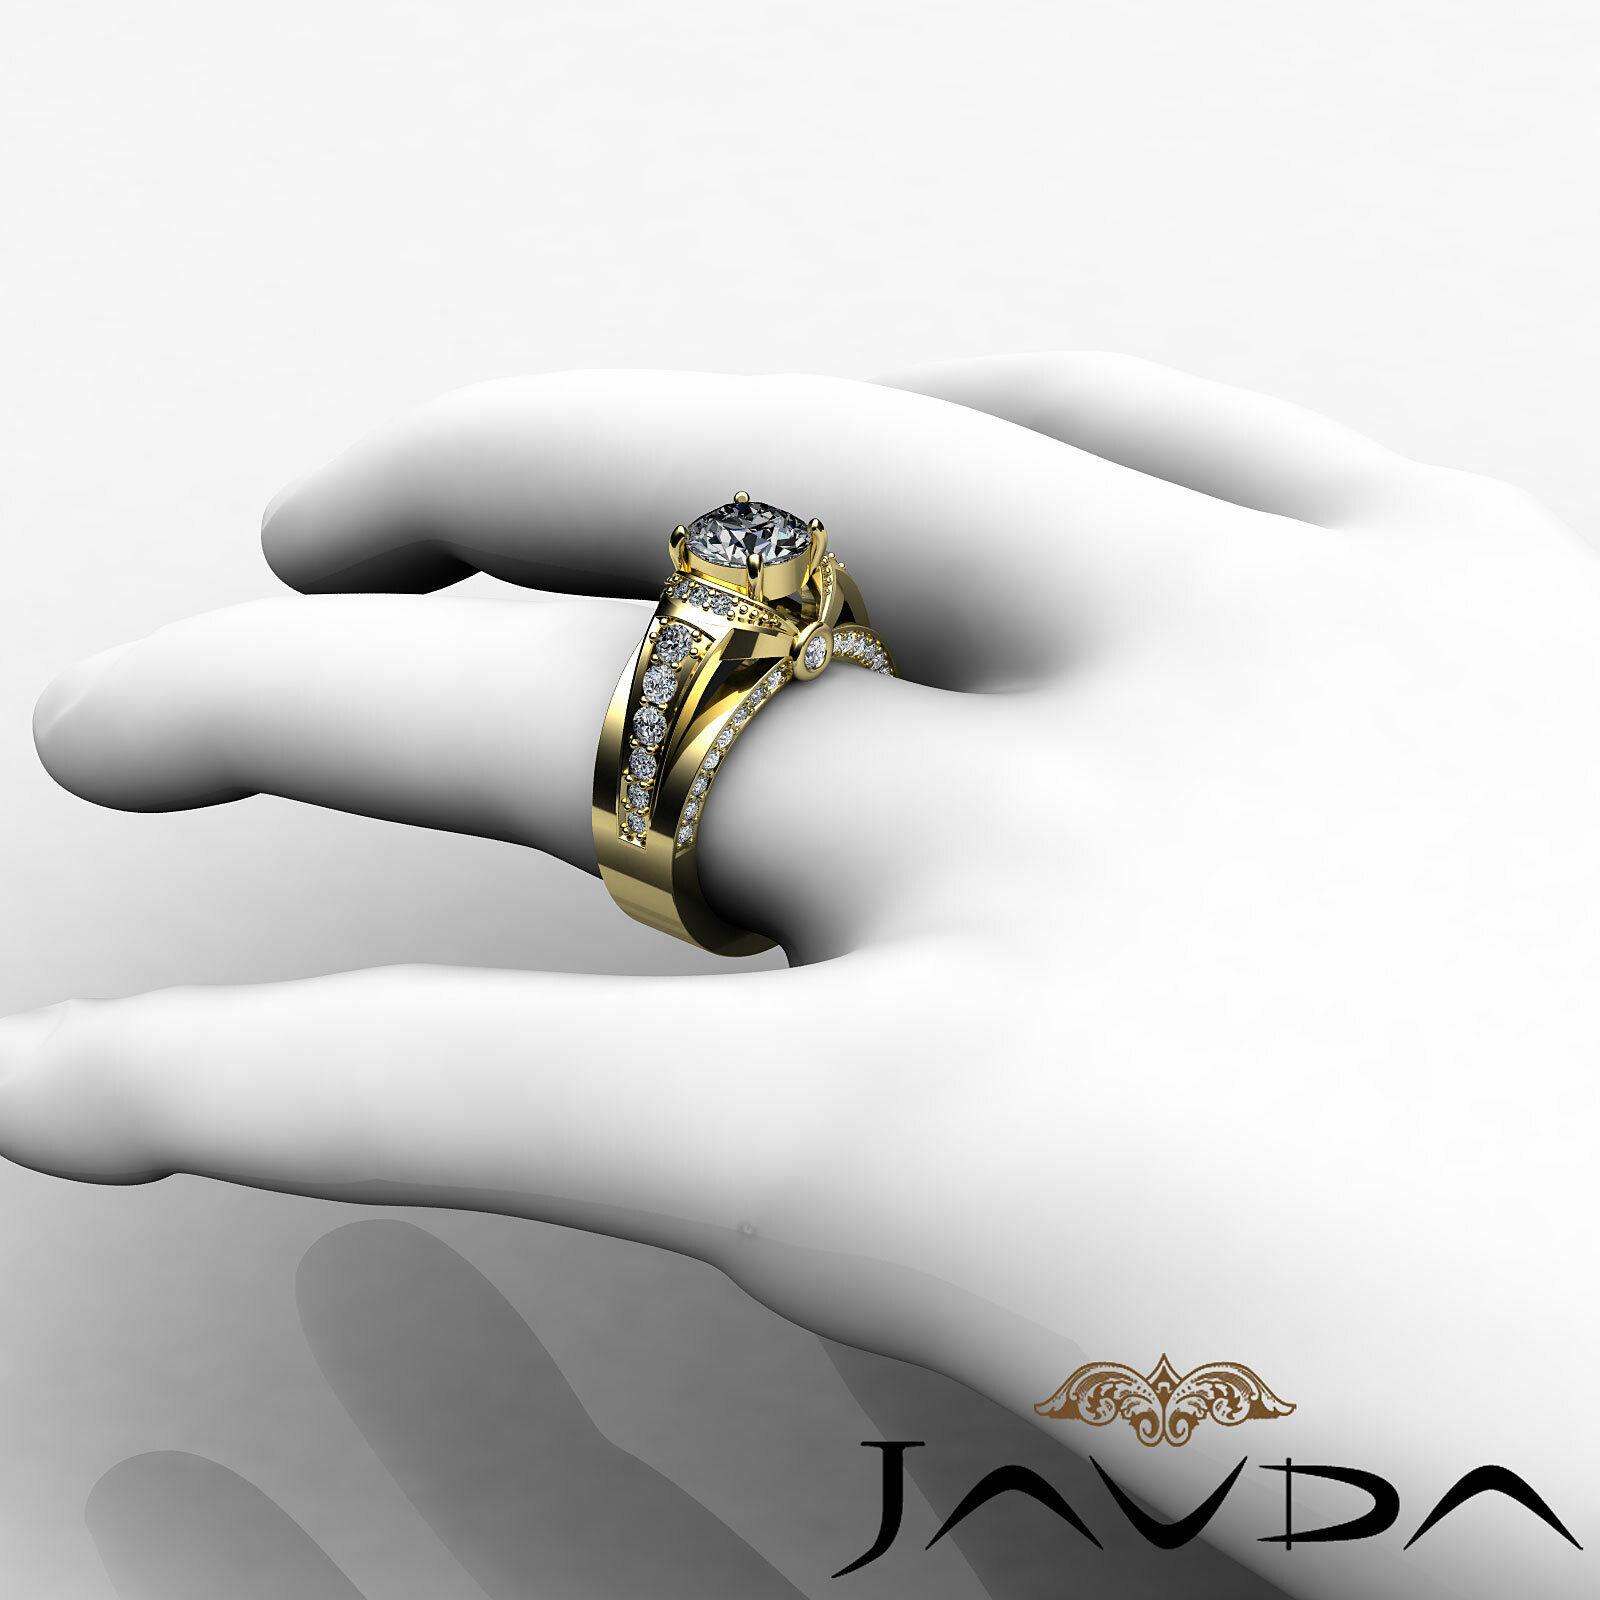 1.7ct Knot Classic Sidestone Round Diamond Engagement Ring GIA H-VVS2 White Gold 11